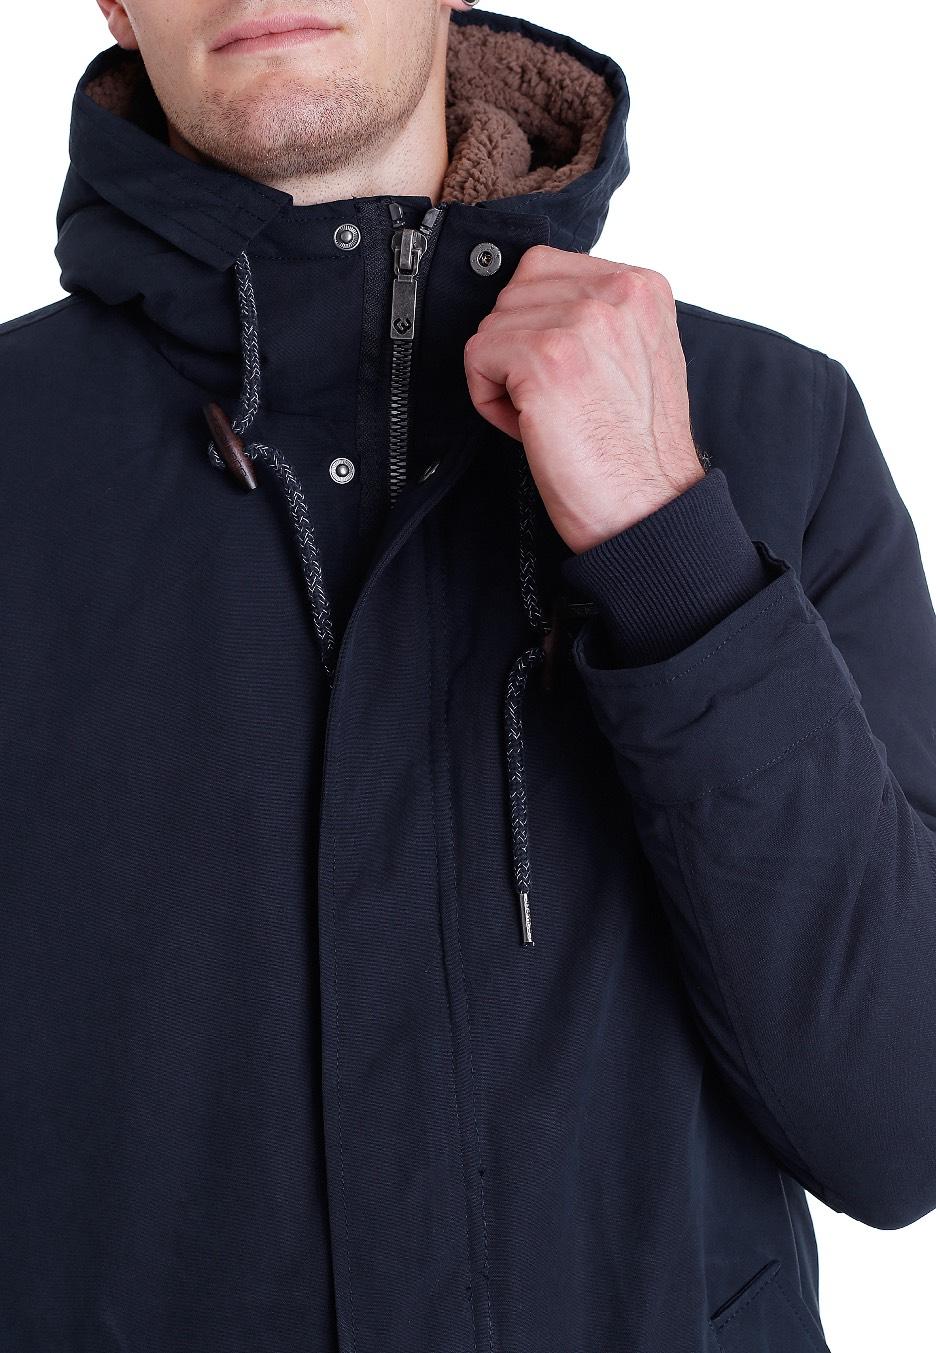 ragwear mr smith navy giacca negozio di streetwear it. Black Bedroom Furniture Sets. Home Design Ideas